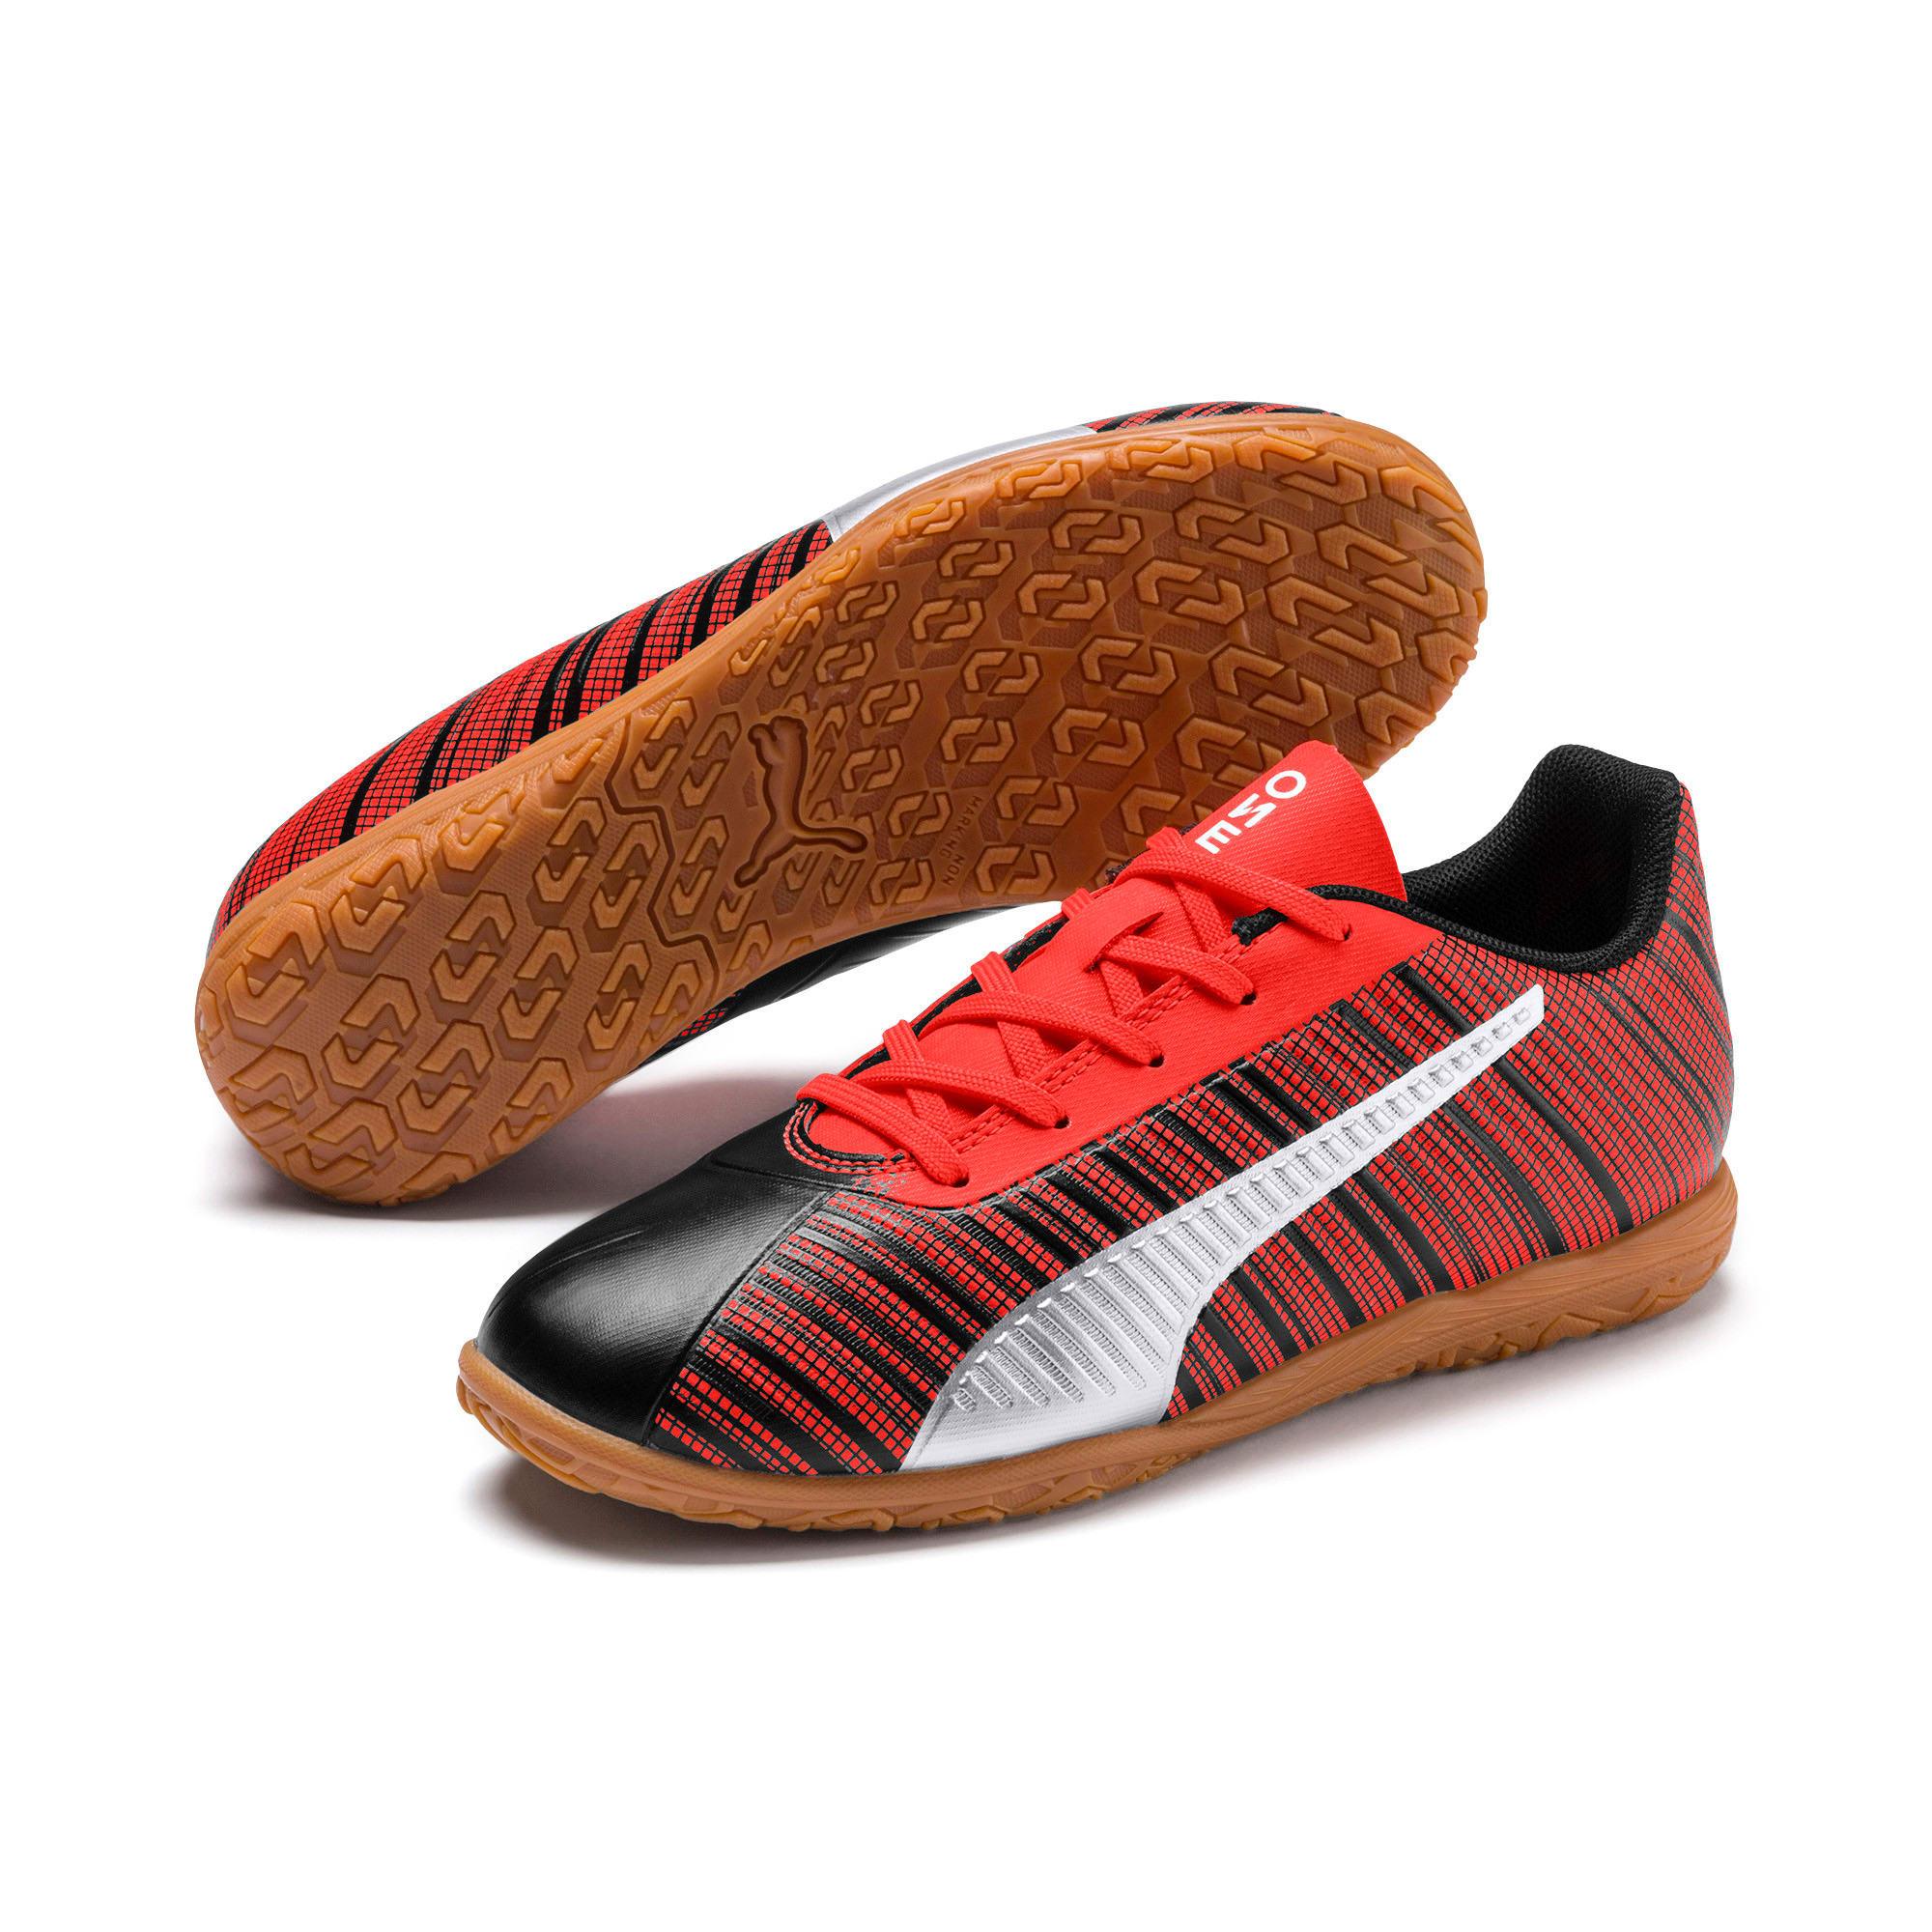 Miniatura 2 de Zapatos de fútbol PUMA ONE 5.4 IT JR, Black-Red-Aged Silver-Gum, mediano